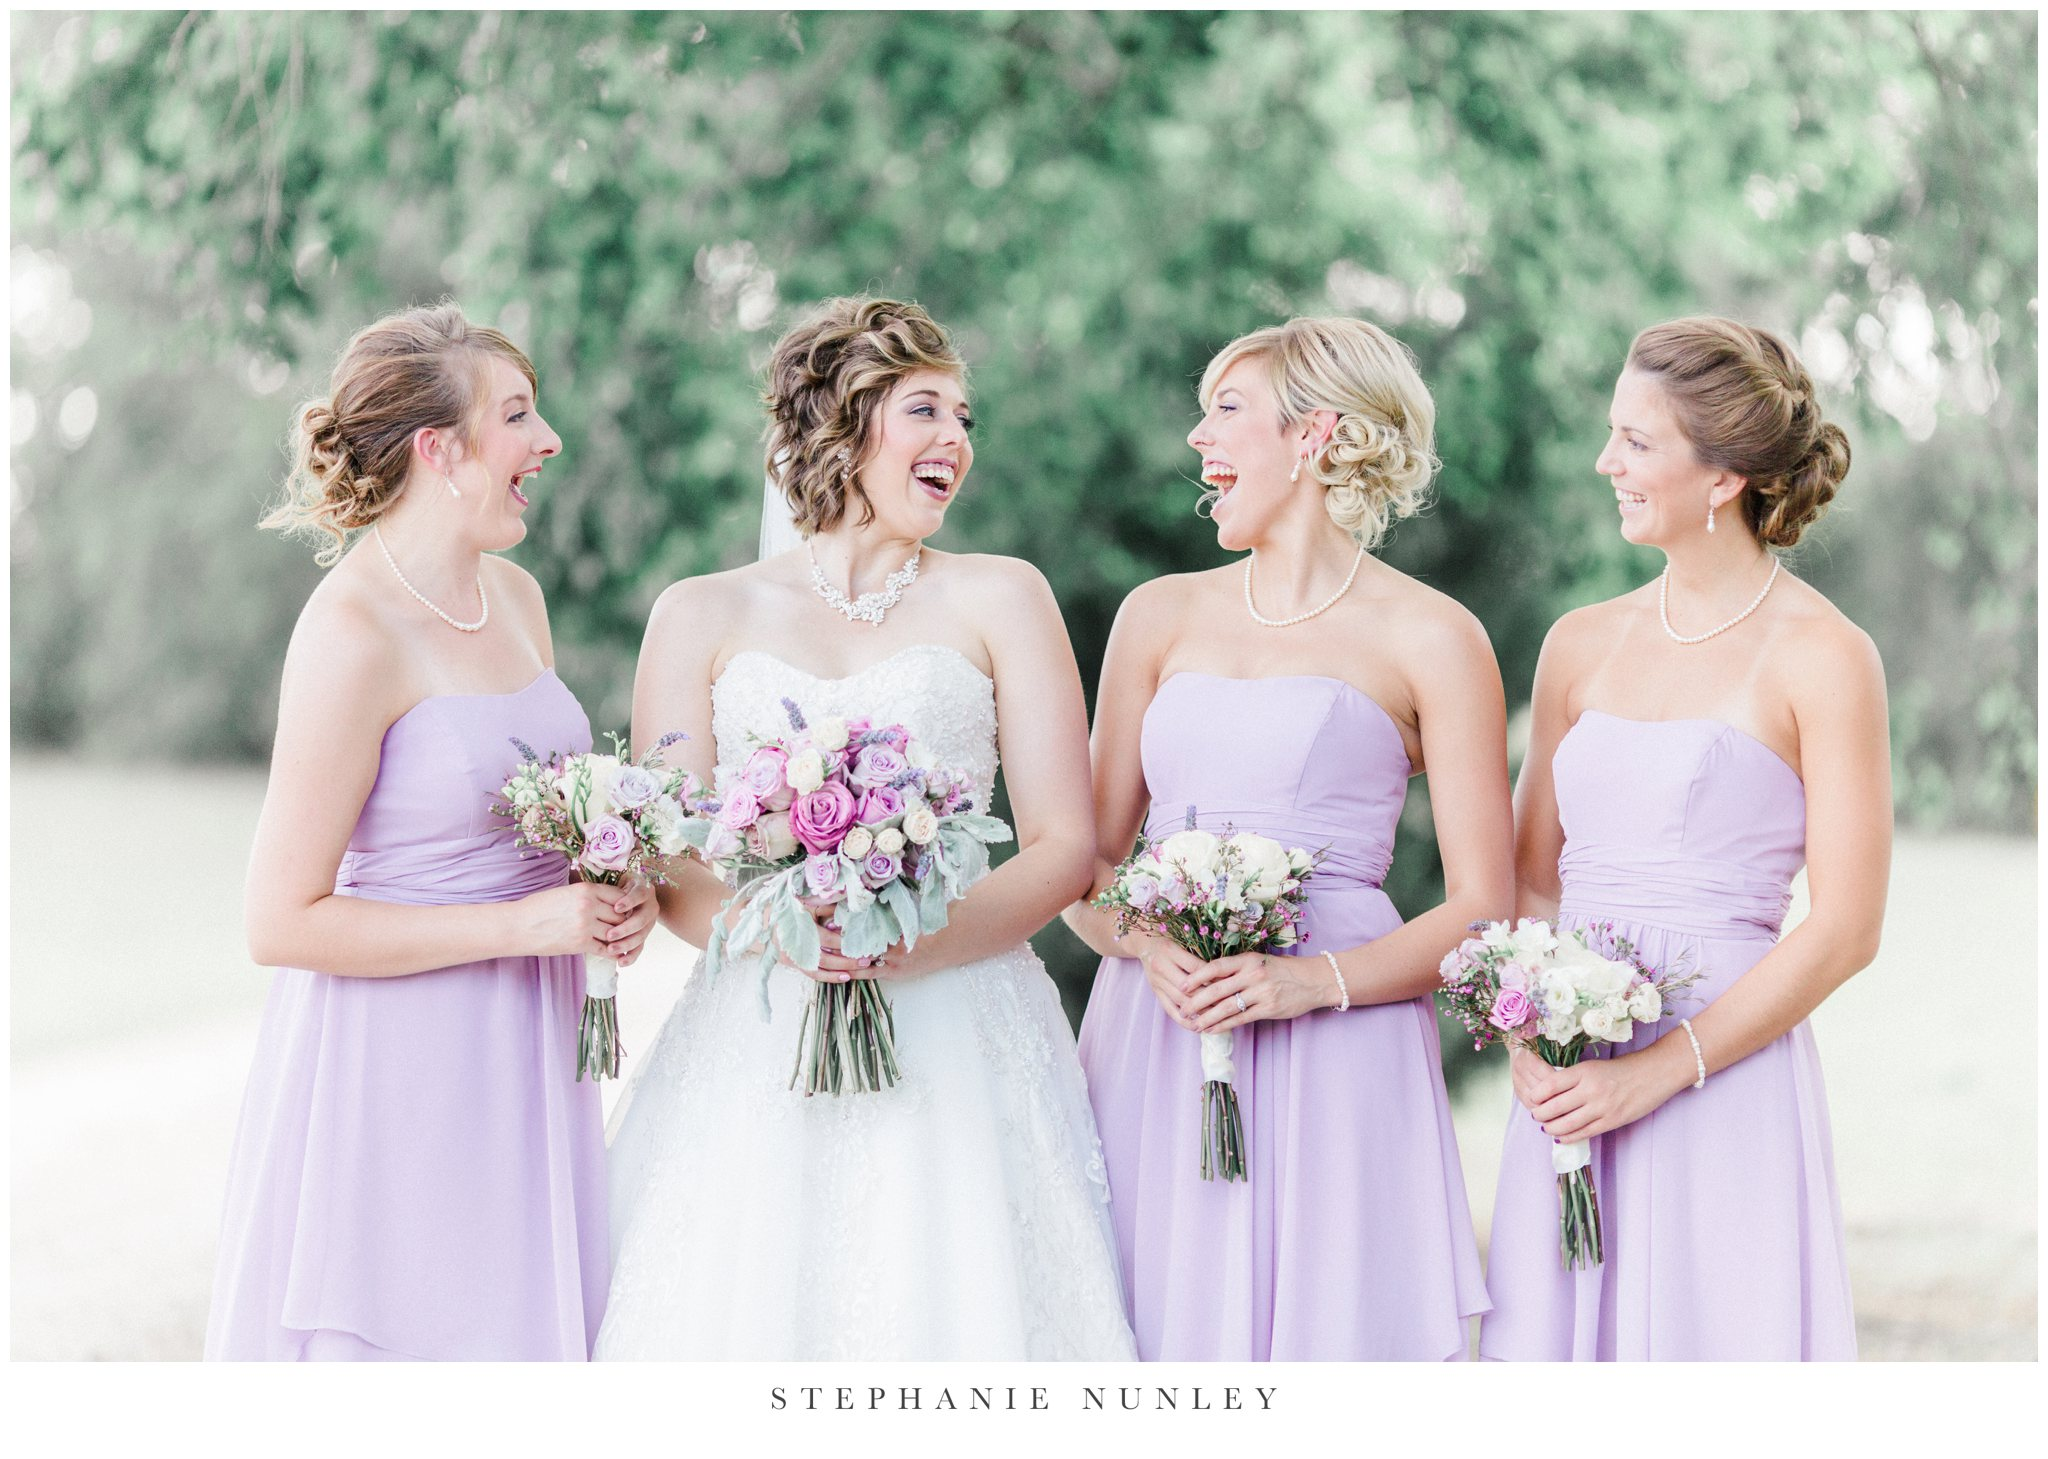 southern-classy-outdoor-barn-wedding-photos-0060.jpg